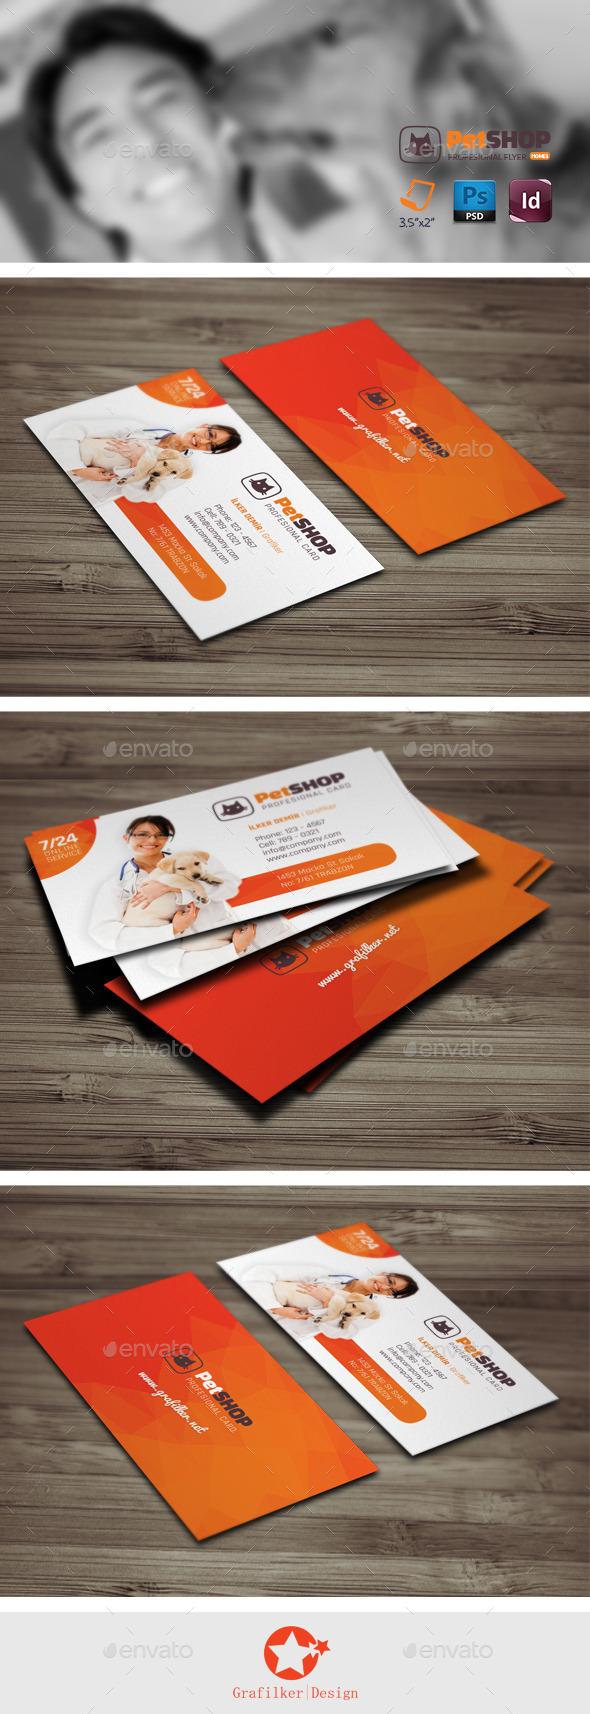 Pet Shop Business Card Templates - Business Cards Print Templates